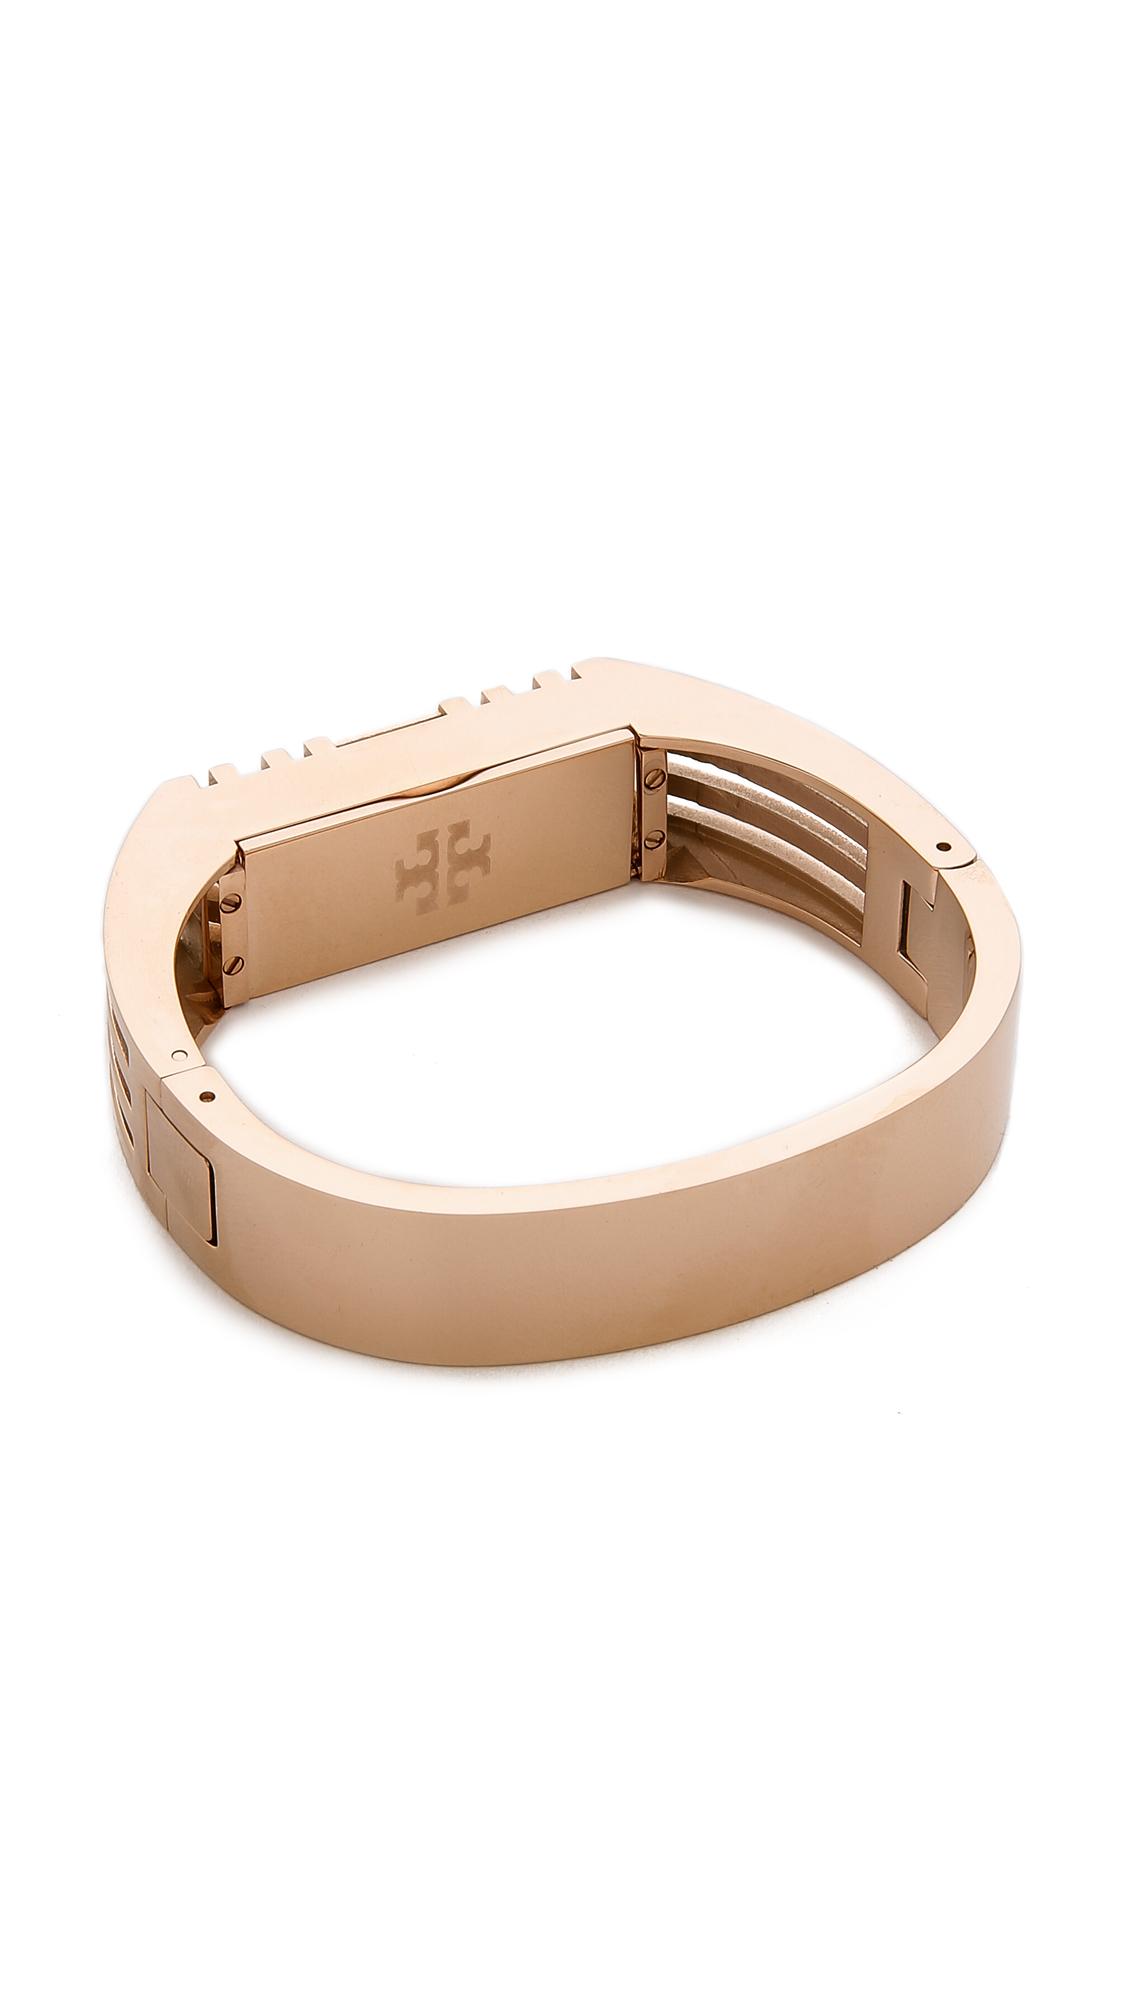 tory burch for fitbit metal hinged bracelet rose gold in pink lyst. Black Bedroom Furniture Sets. Home Design Ideas